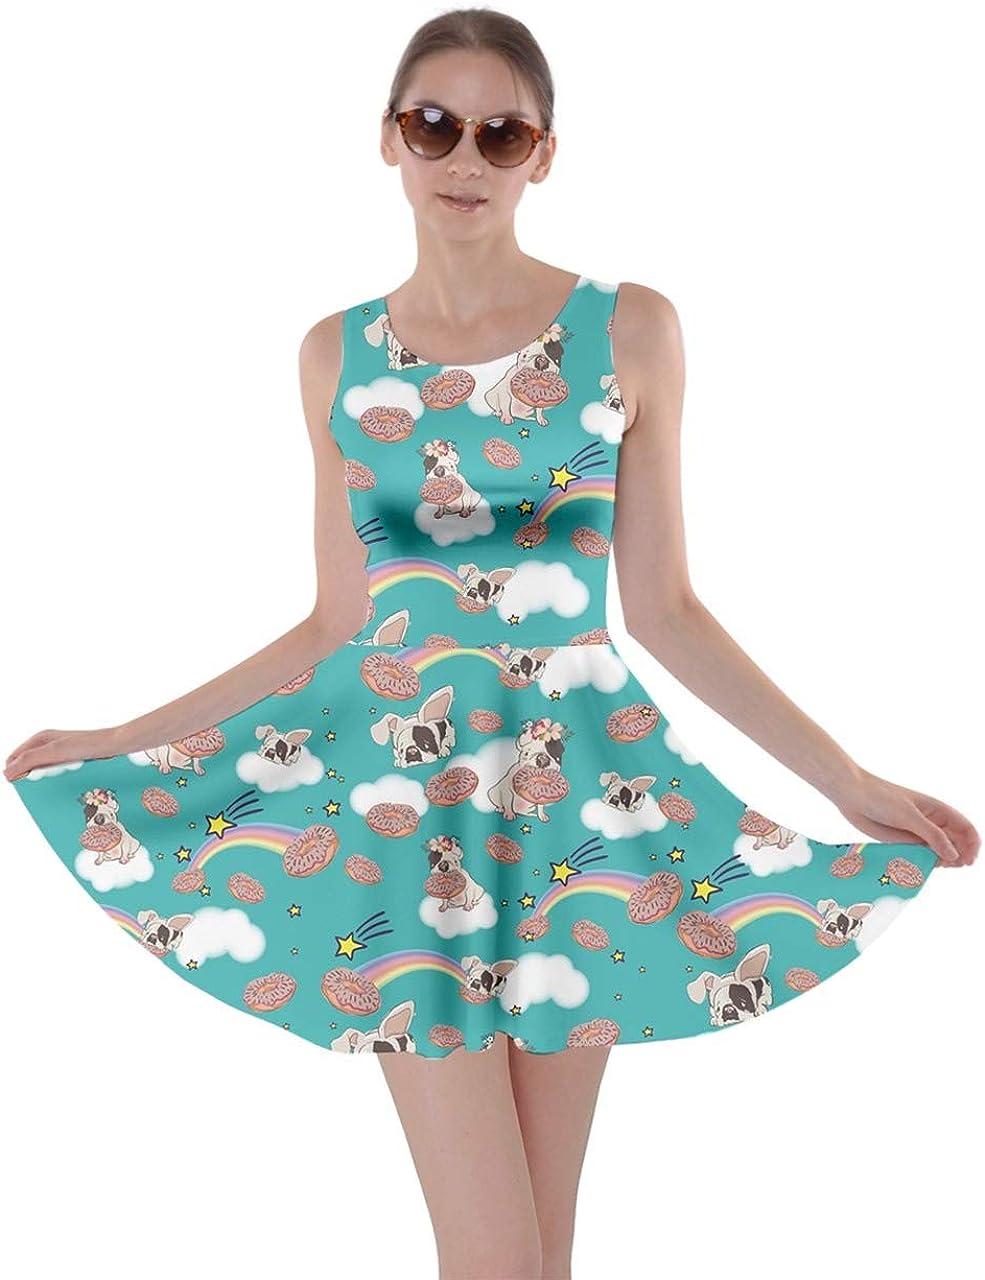 CowCow Womens Party Costume Bears Print Kawaii Cute Ghosts Skater Dress, XS-5XL